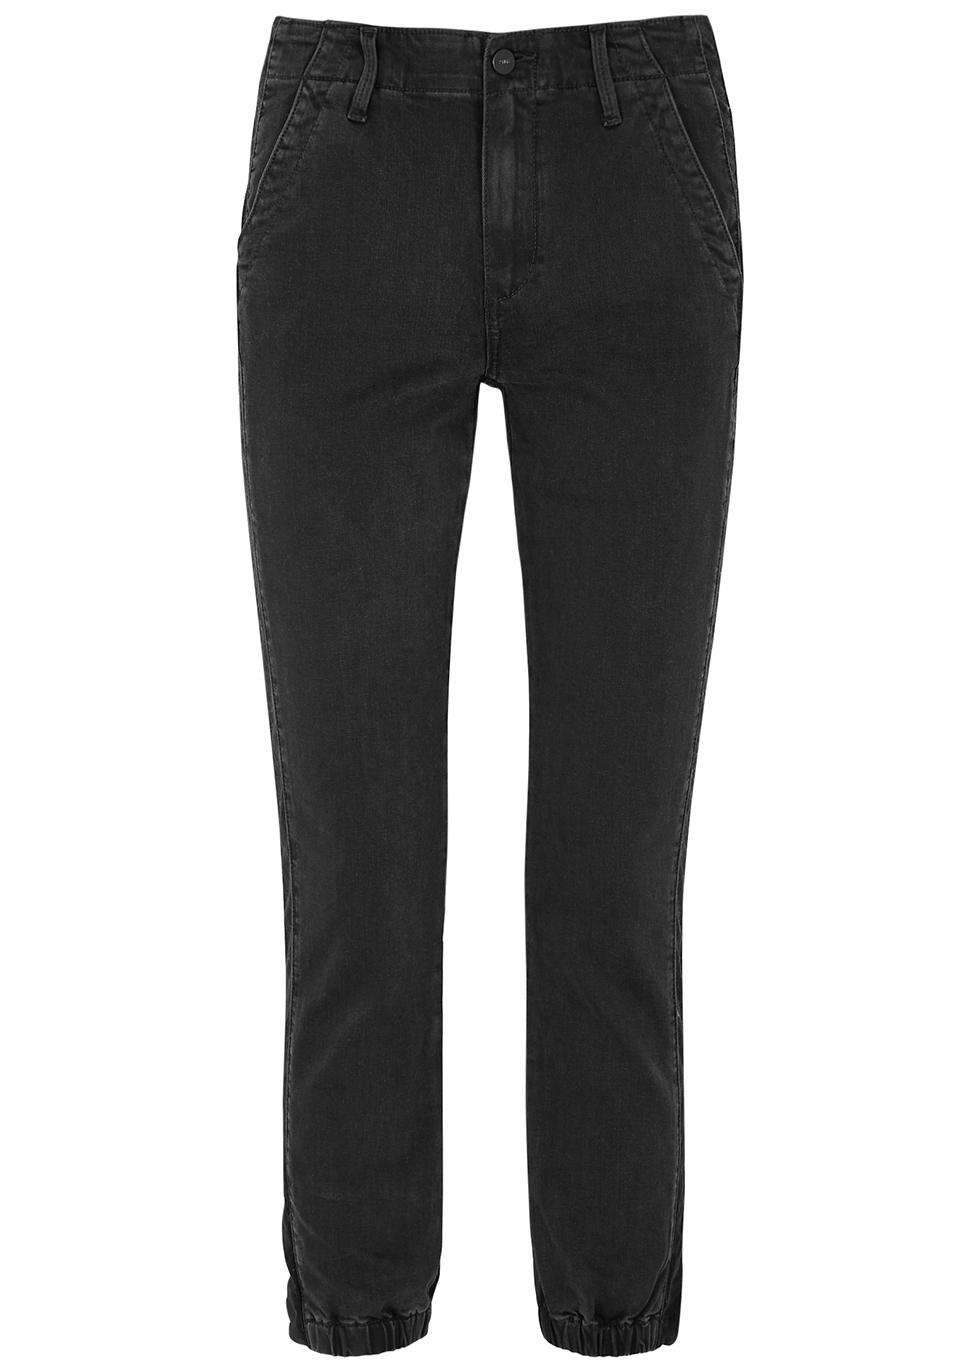 Mayslie Transcend black stretch-denim trousers